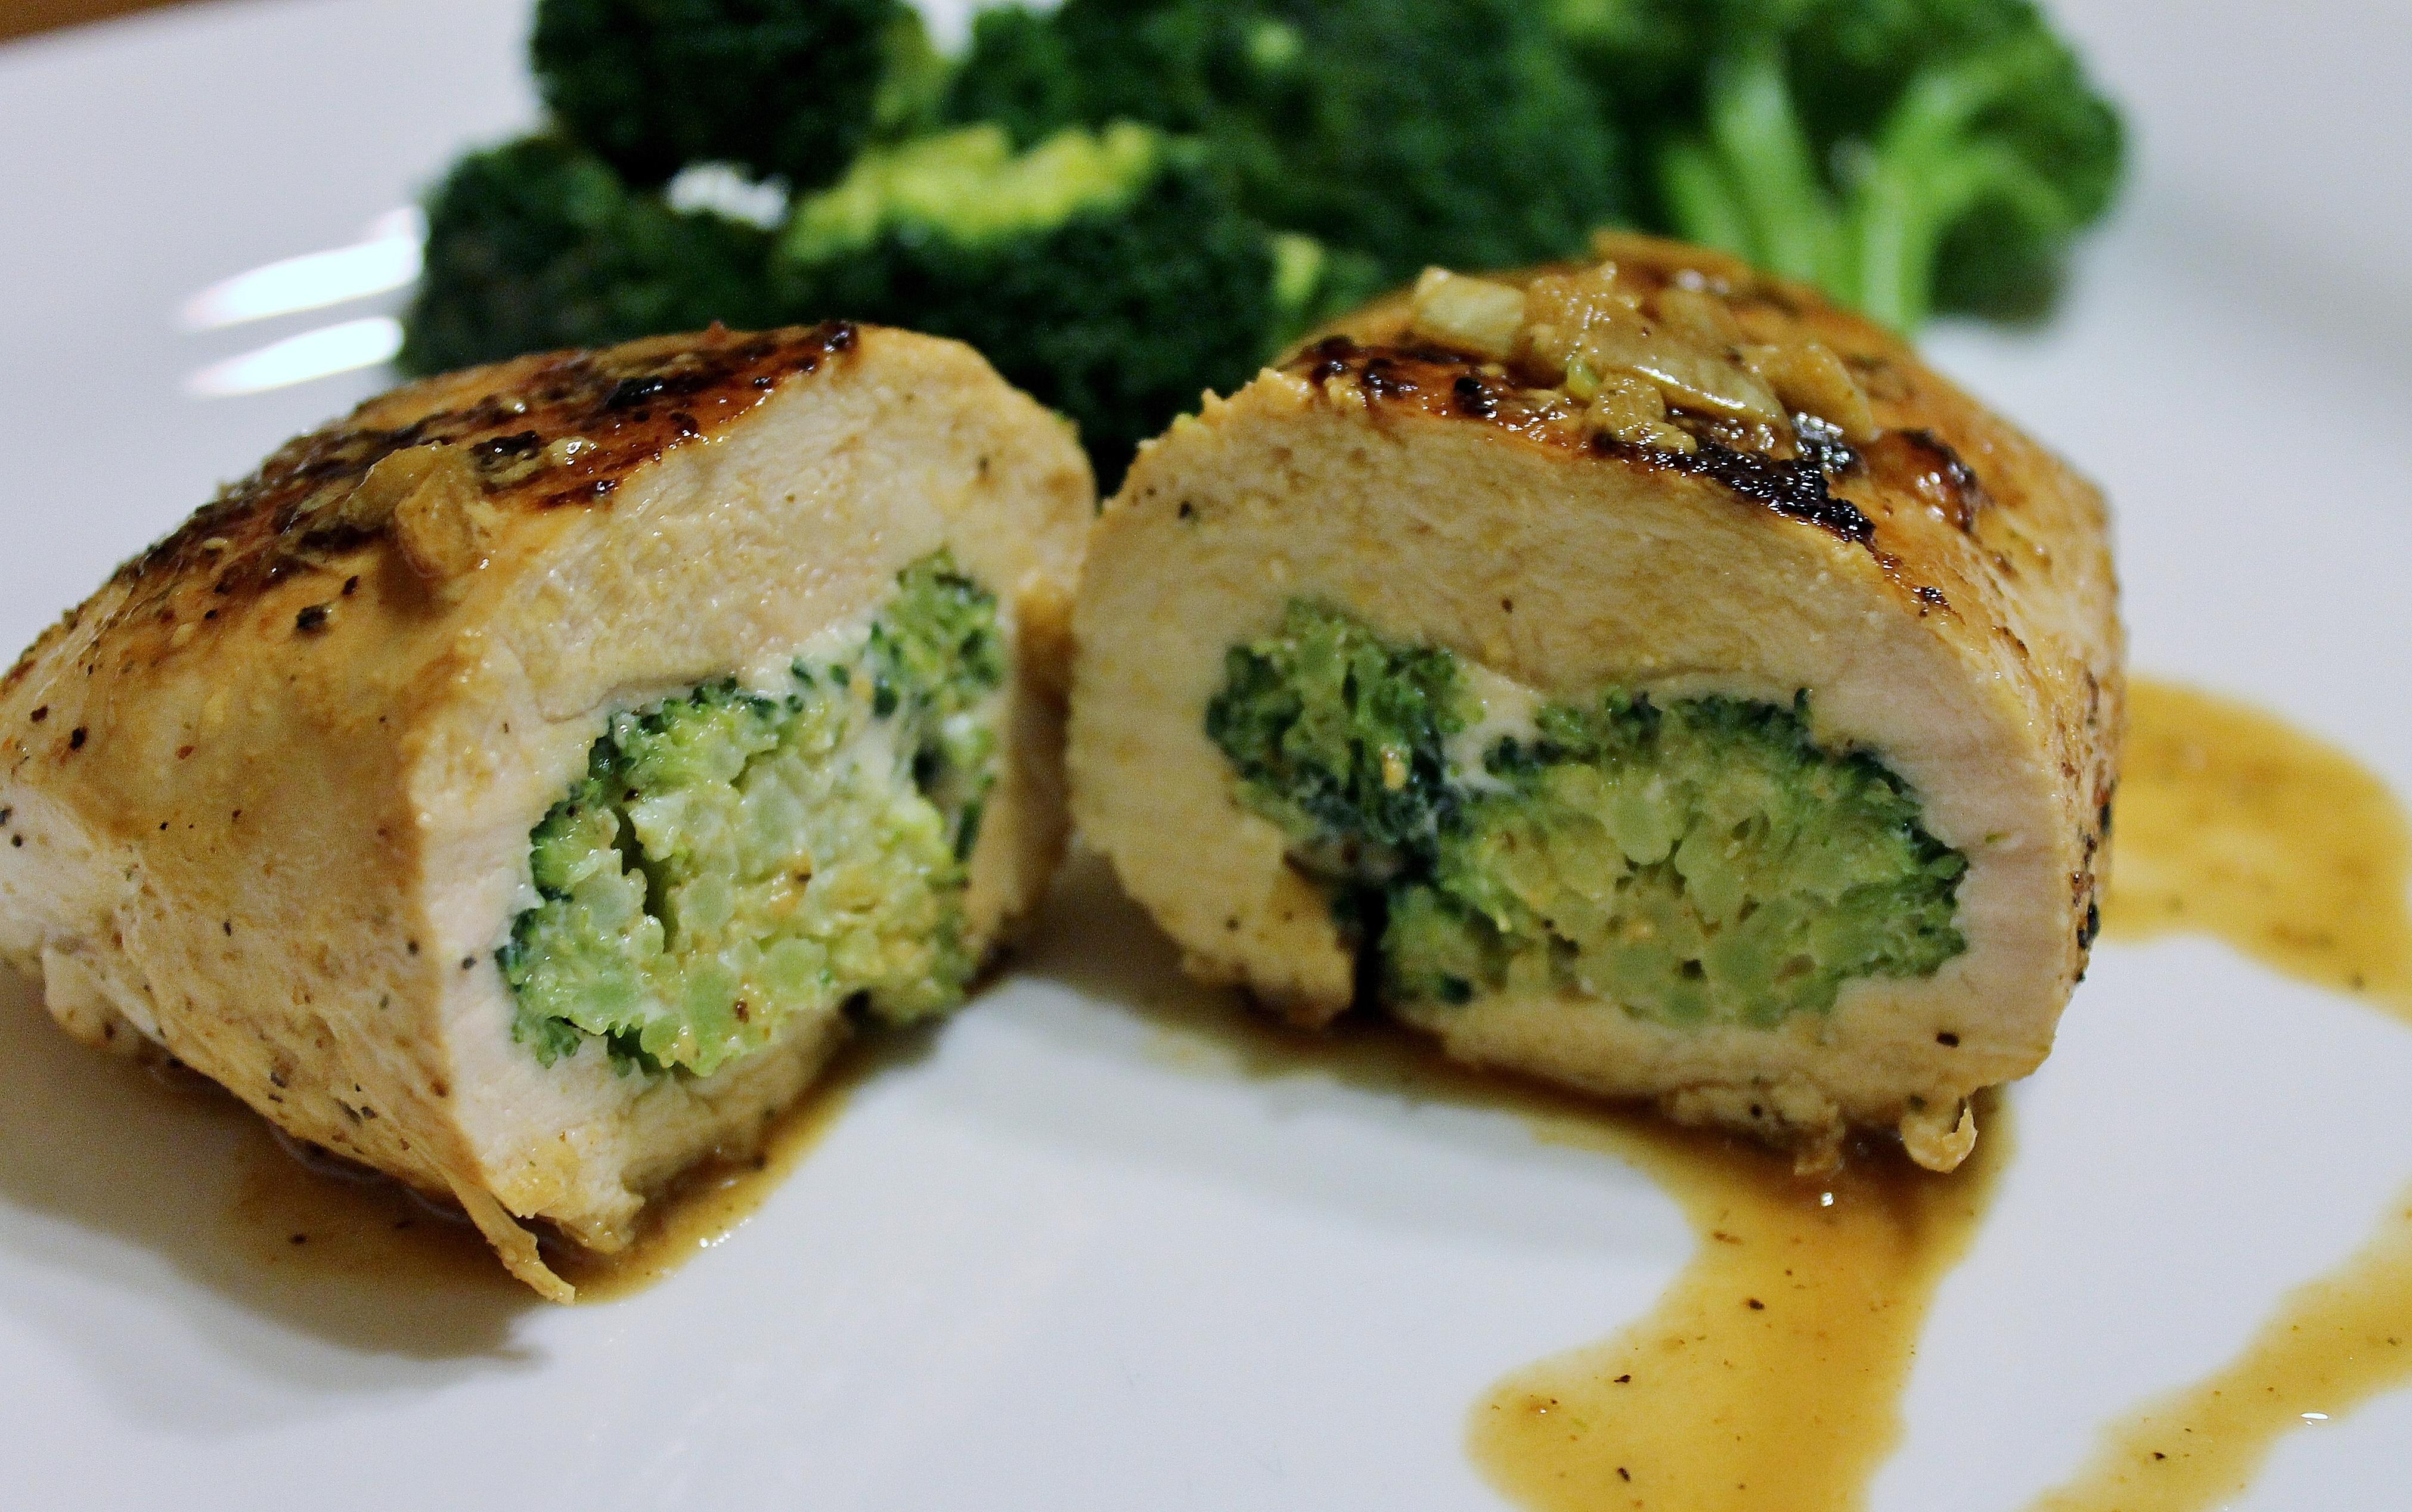 Broccoli Cheese Stuffed Chicken Light Easy Recipe-6236